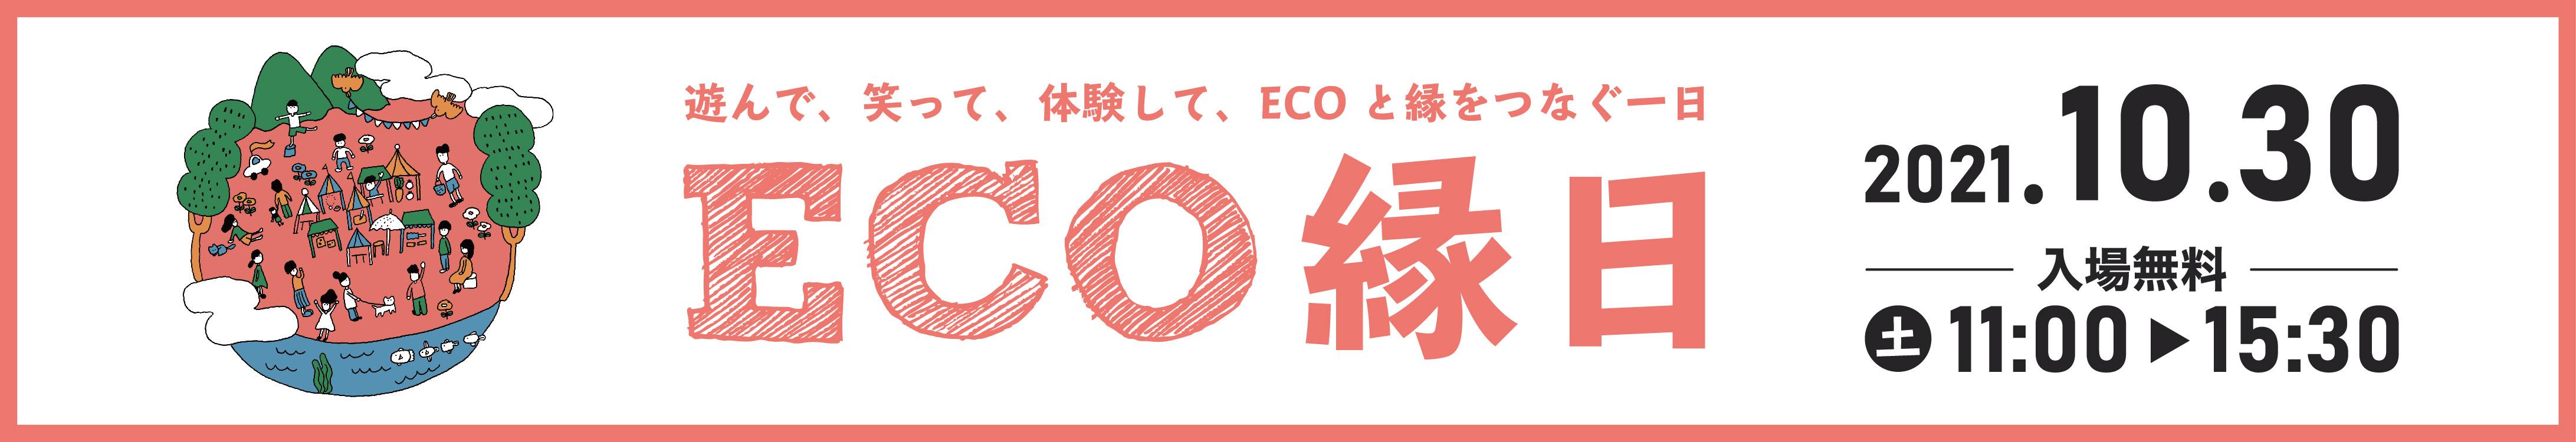 eco縁日2021